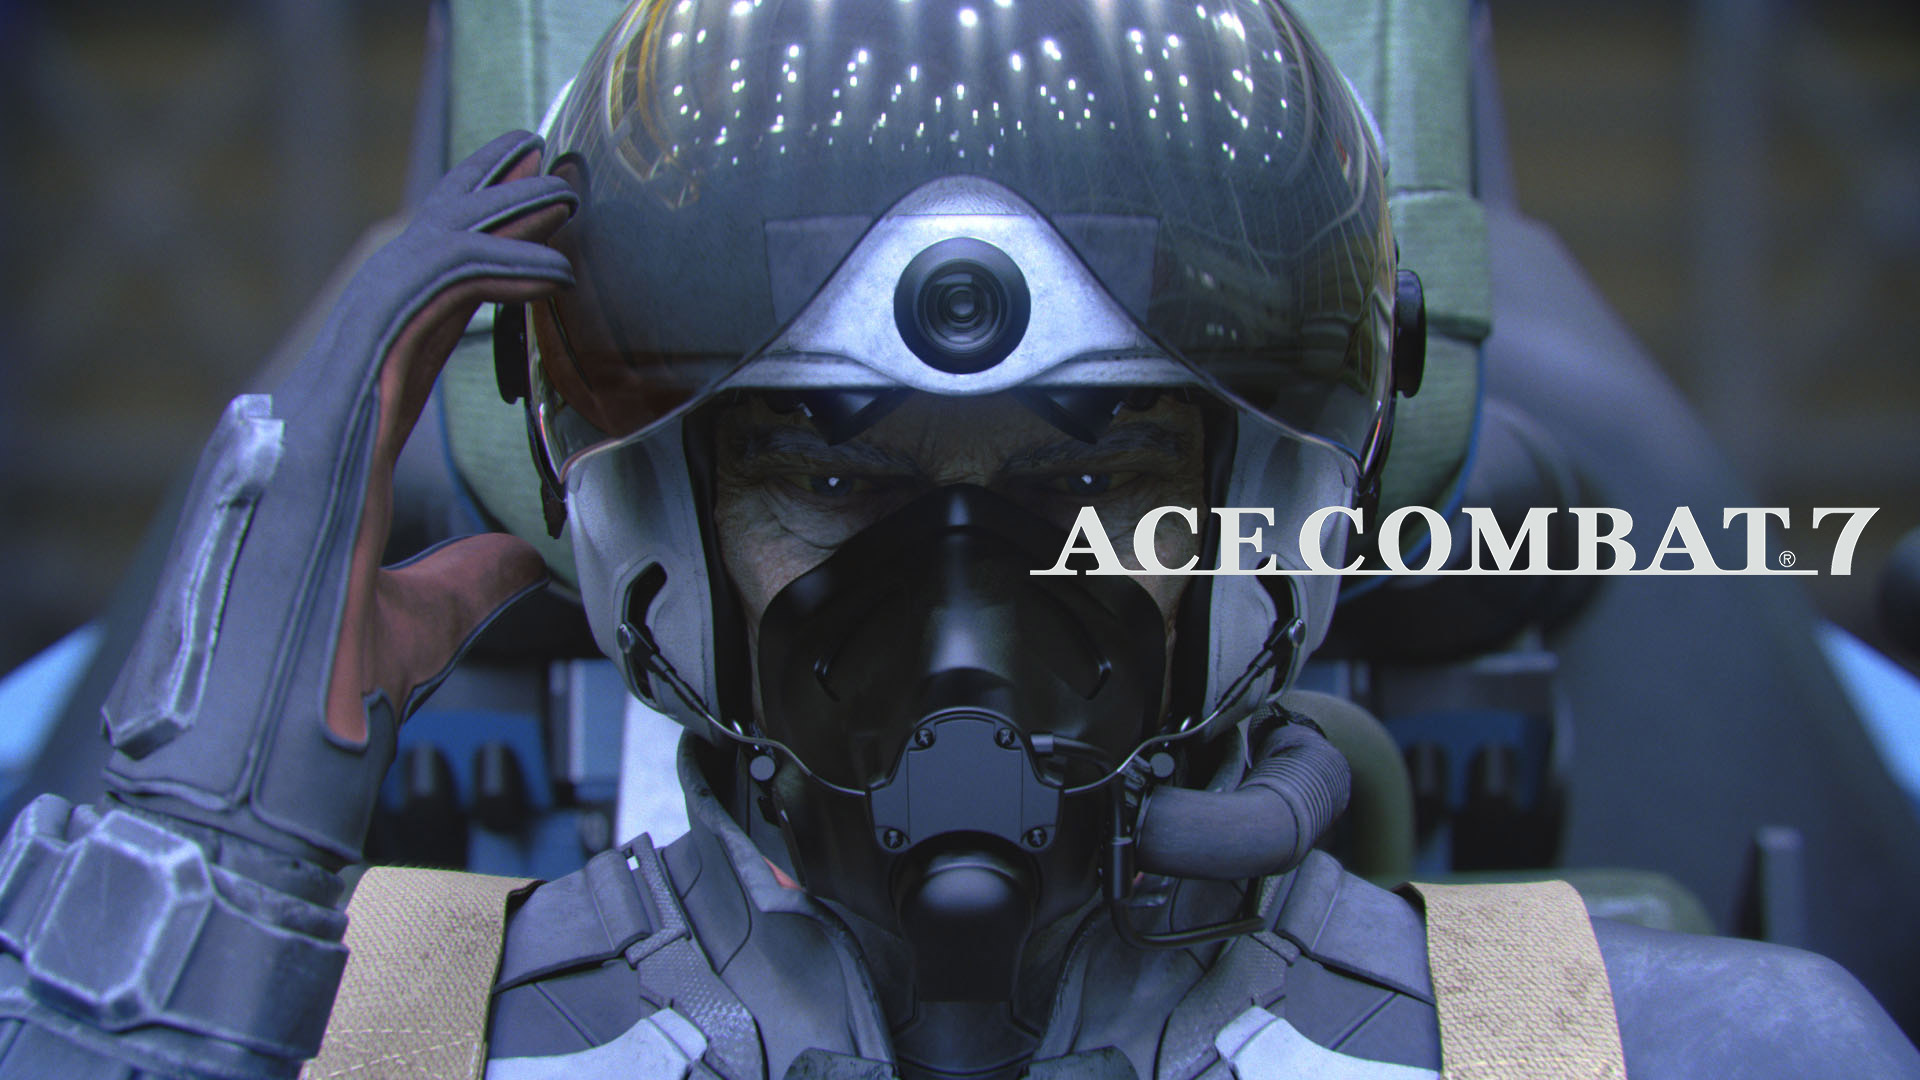 Free Ace Combat 7 Wallpaper in 1920x1080